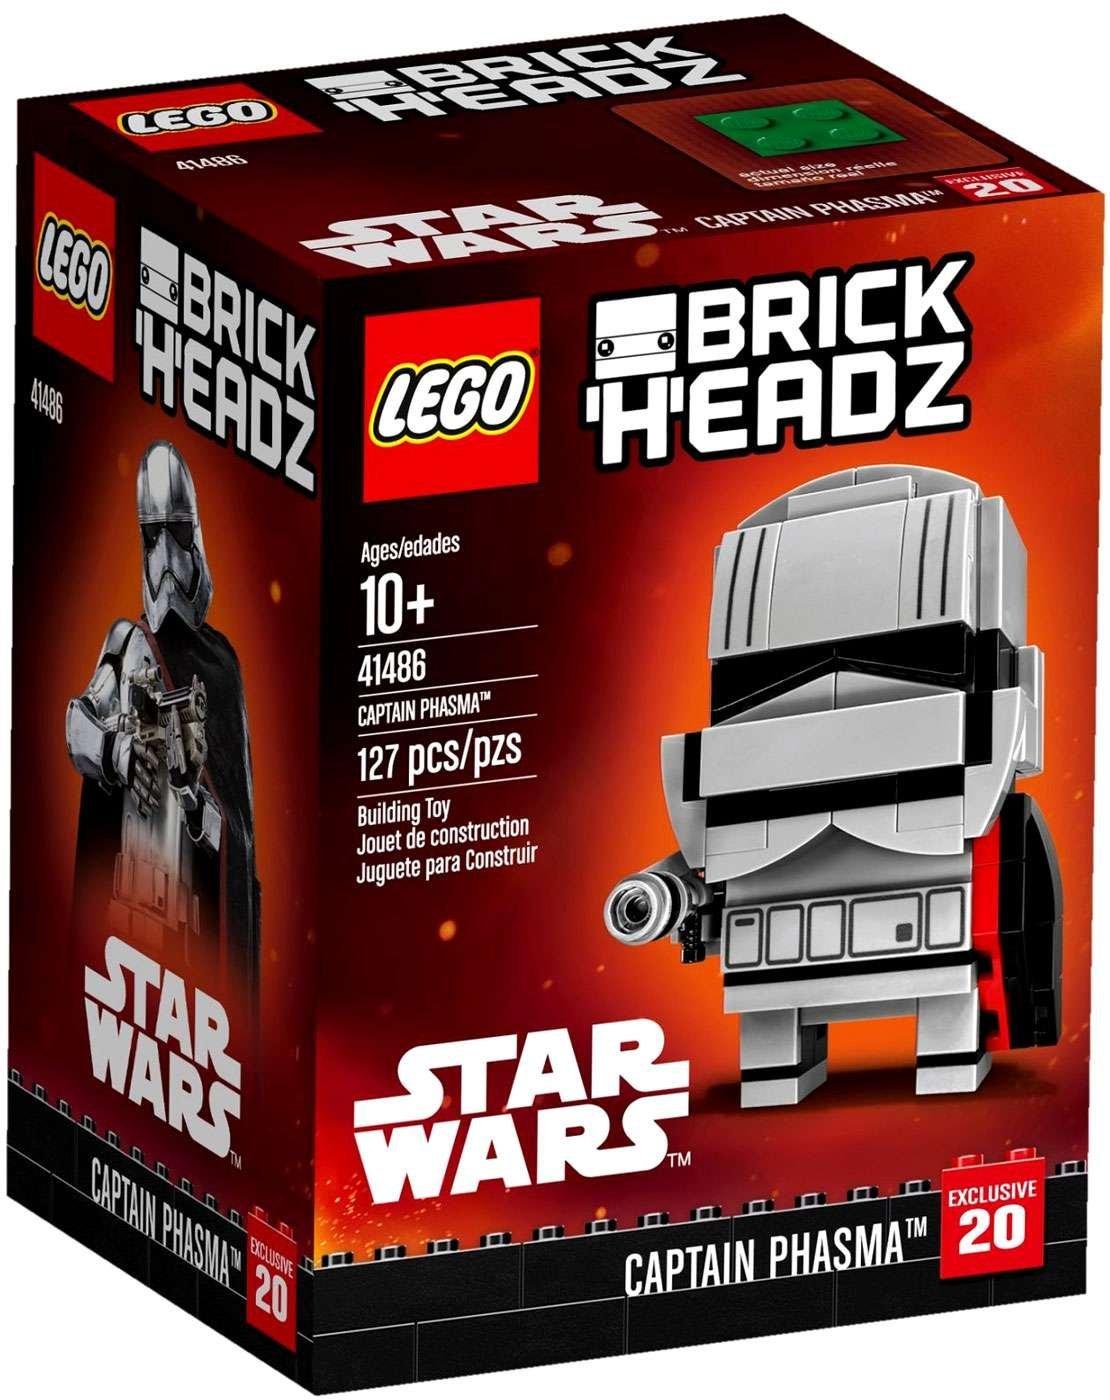 FA Captain Phasma Lego BrickHeadz Set